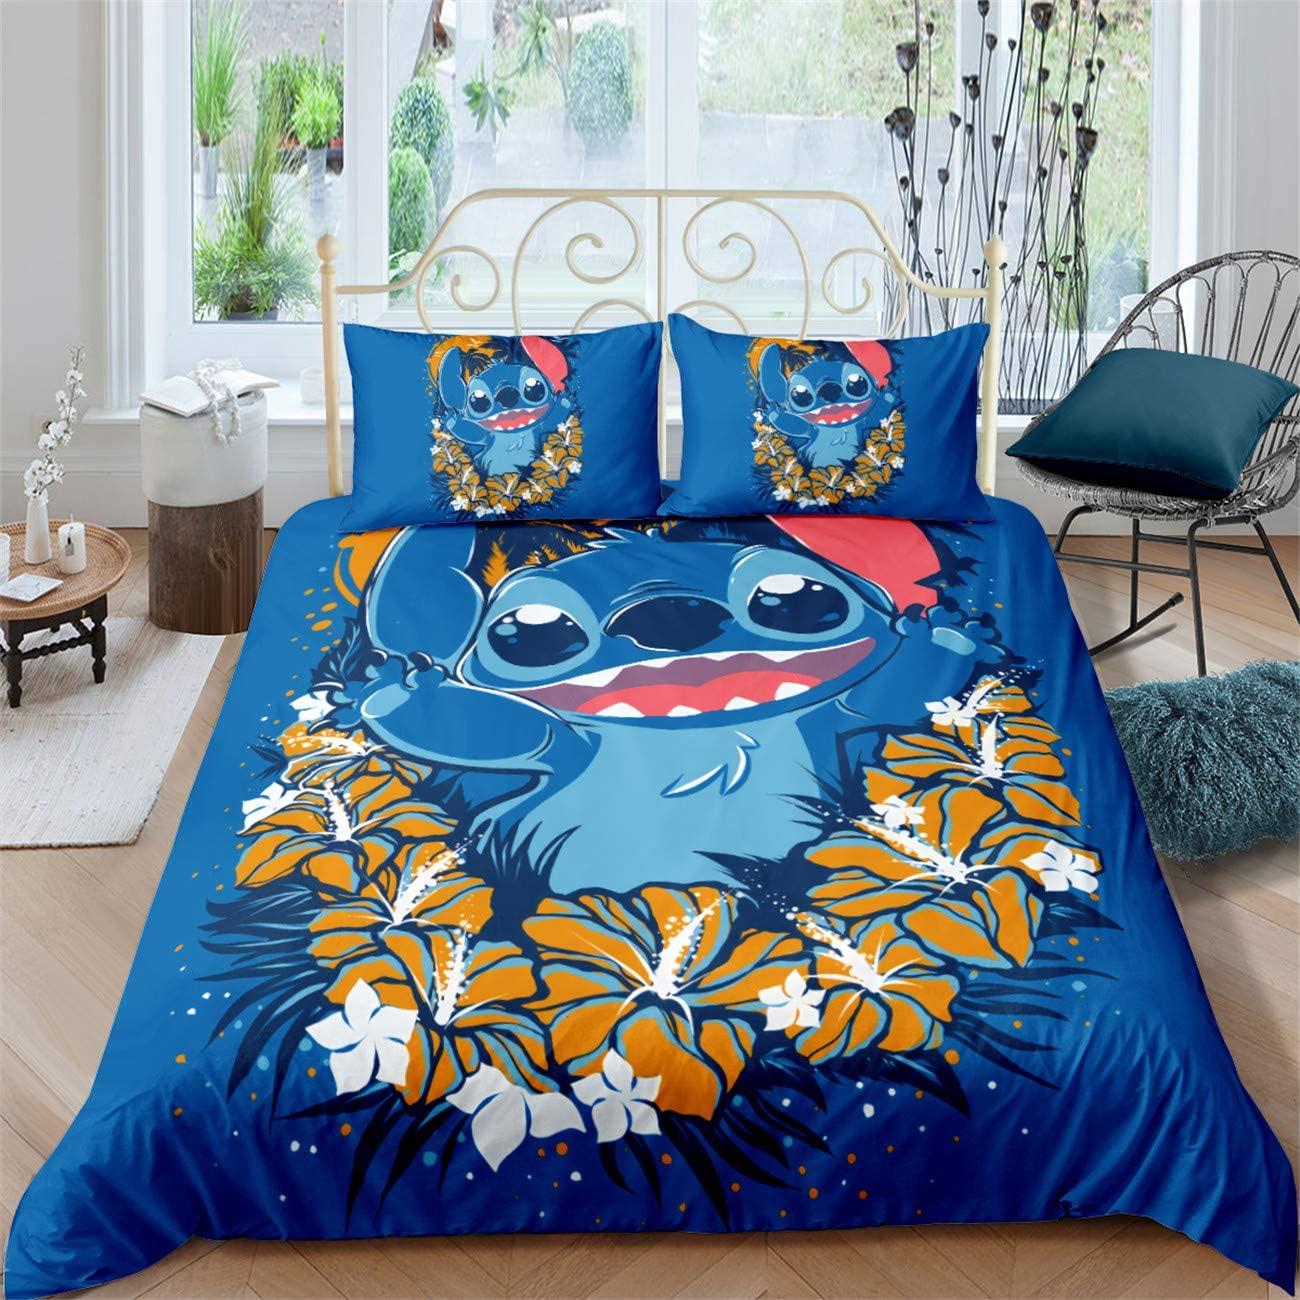 AXIONG 3D Lilo & Stitch Duvet Cover Set Bedding Set for Kids 100% Microfiber Duvet Cover Set Suitable for Kids Teen Adult 3 Piece 1Duvet Cover 2 Pillow Set Twin Full Queen King Size